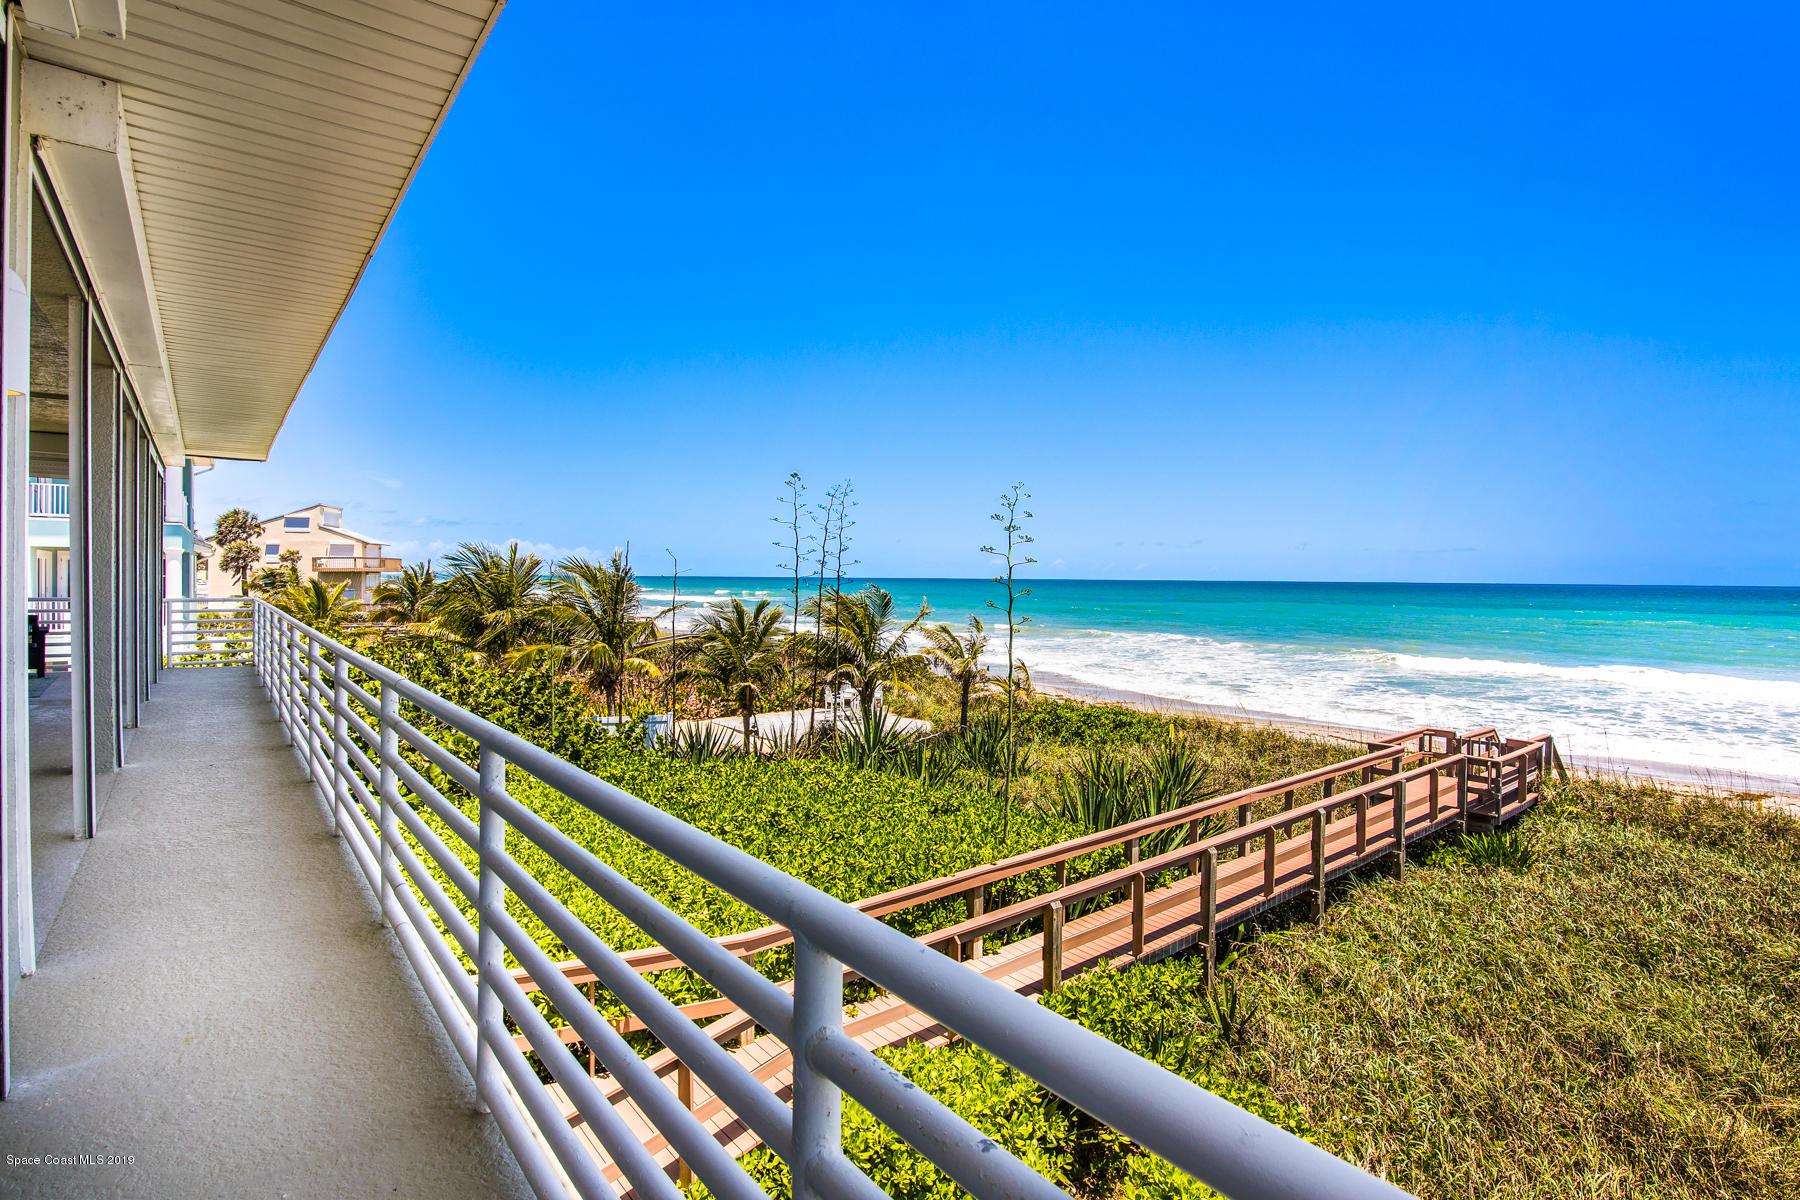 Additional photo for property listing at 2775 S Highway A1a Melbourne Beach, Florida 32951 Estados Unidos